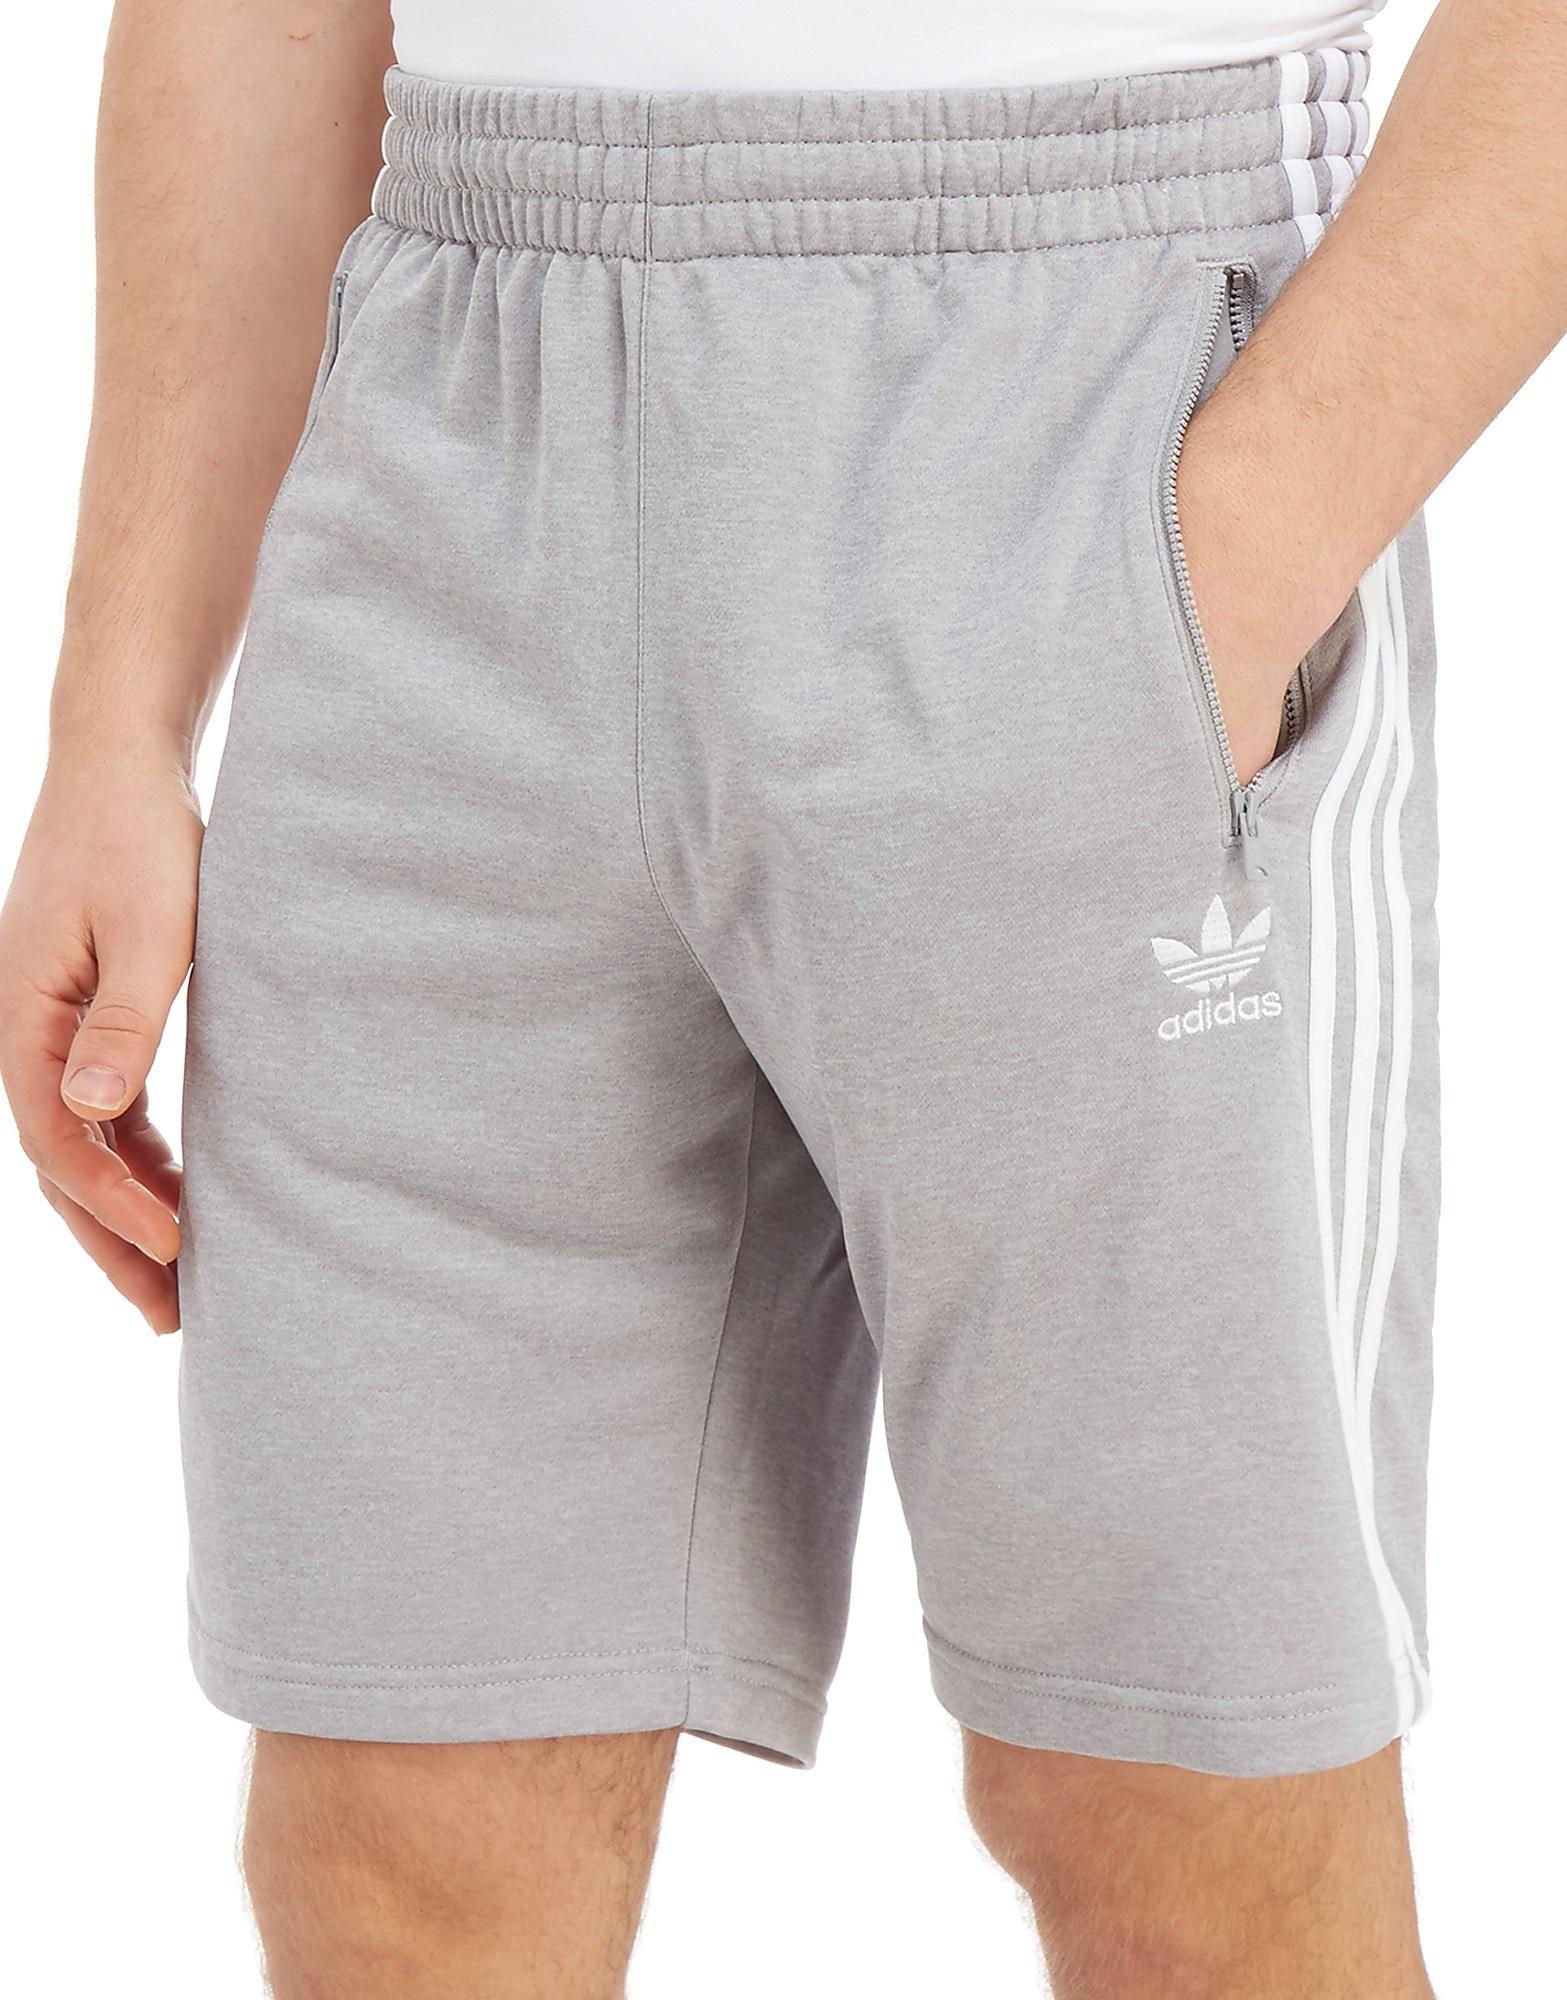 adidas Originals California Poly Shorts